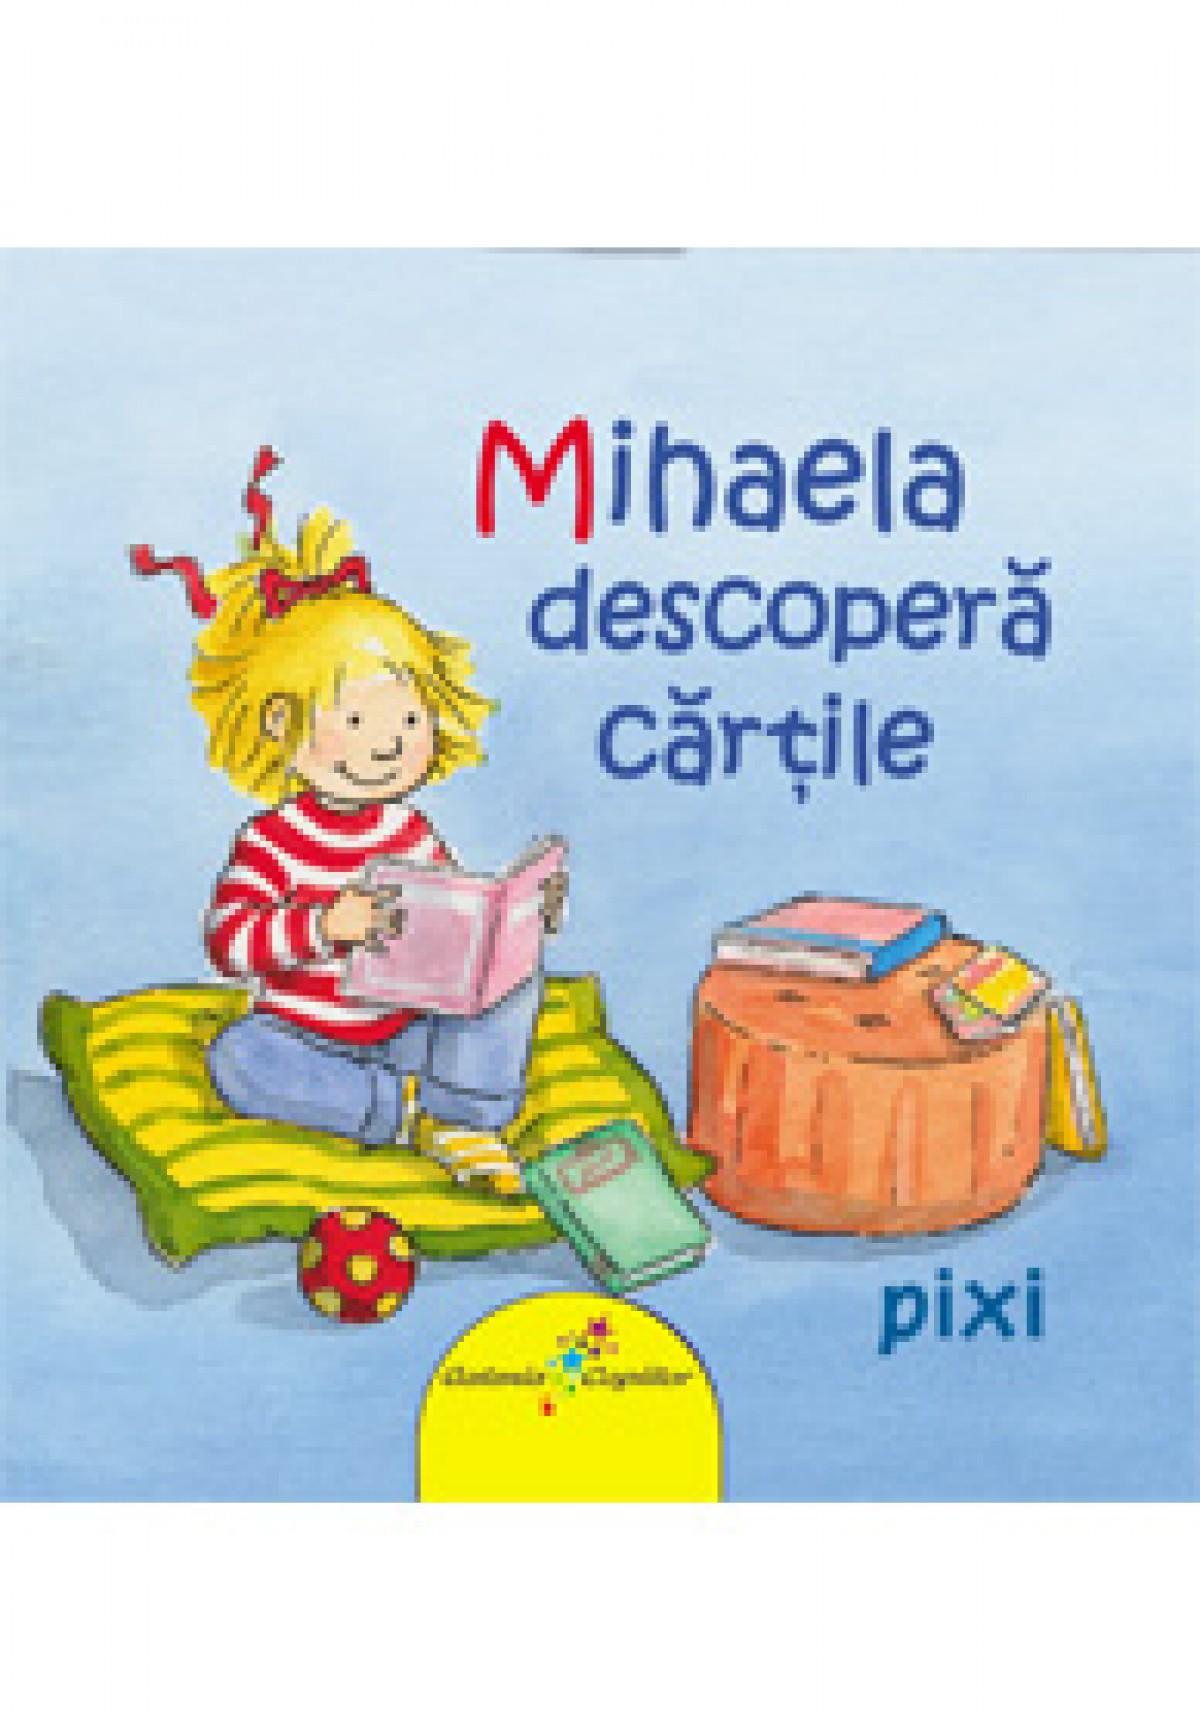 Mihaela descopera cartile